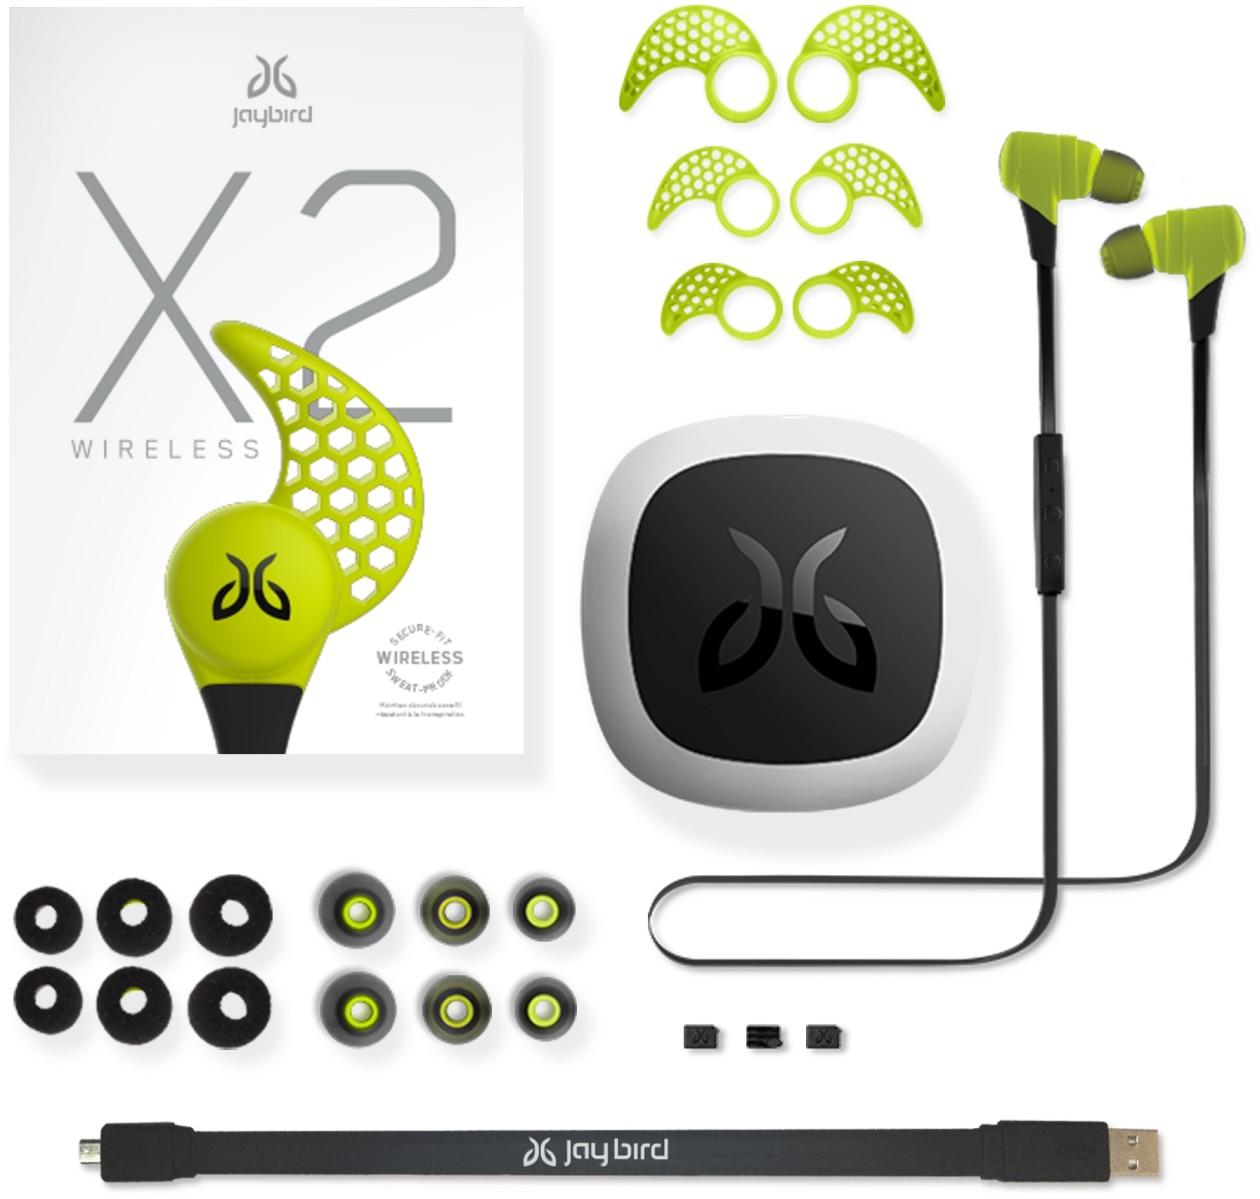 X2 Wireless Buds, da Jaybird